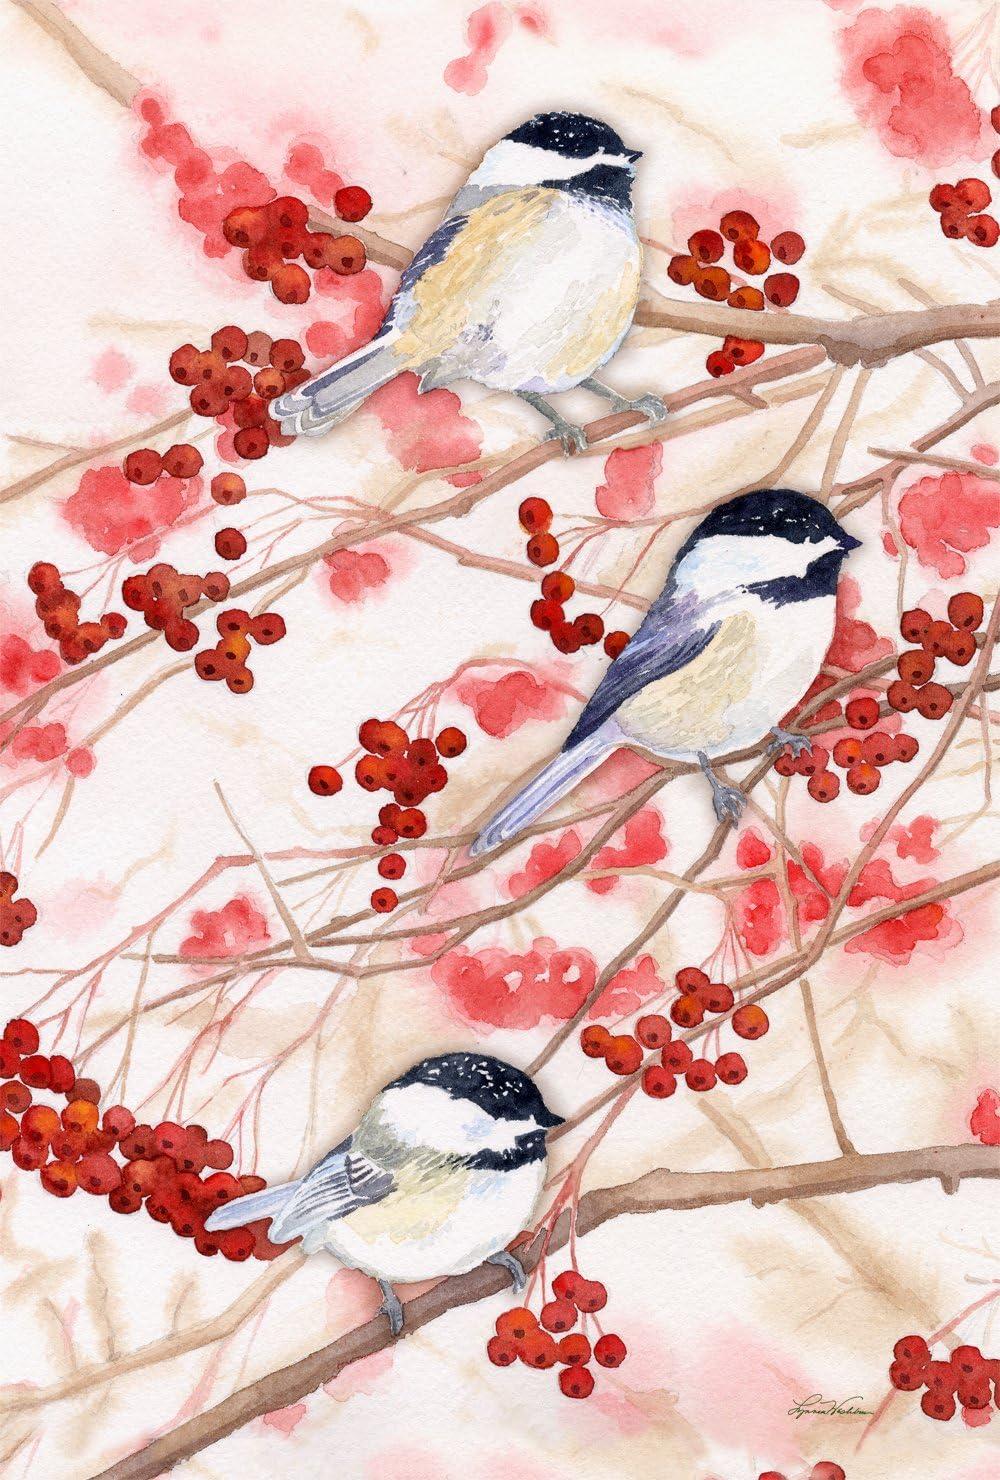 Toland Home Garden Chickadees and Berries 12.5 x 18 Inch Decorative Spring Bird Tree Branch Garden Flag